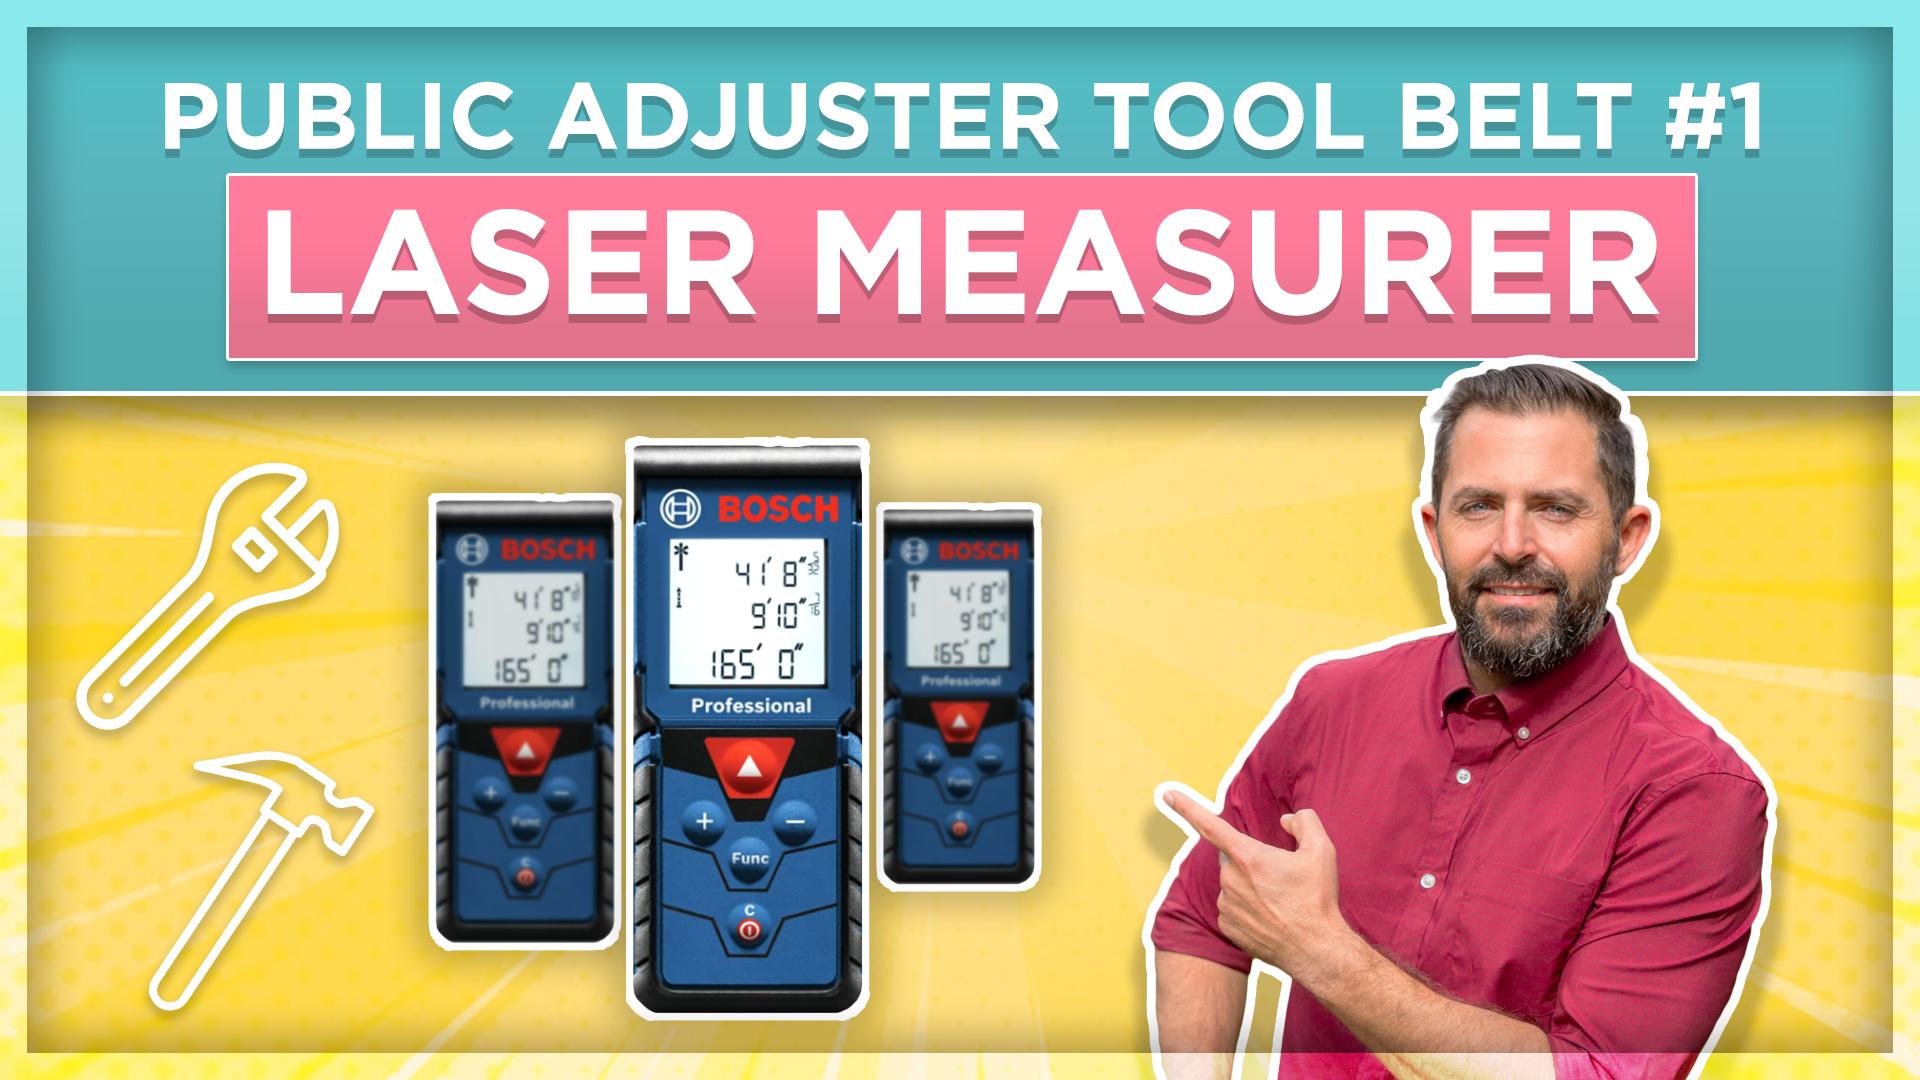 Product Review Laser Measurer